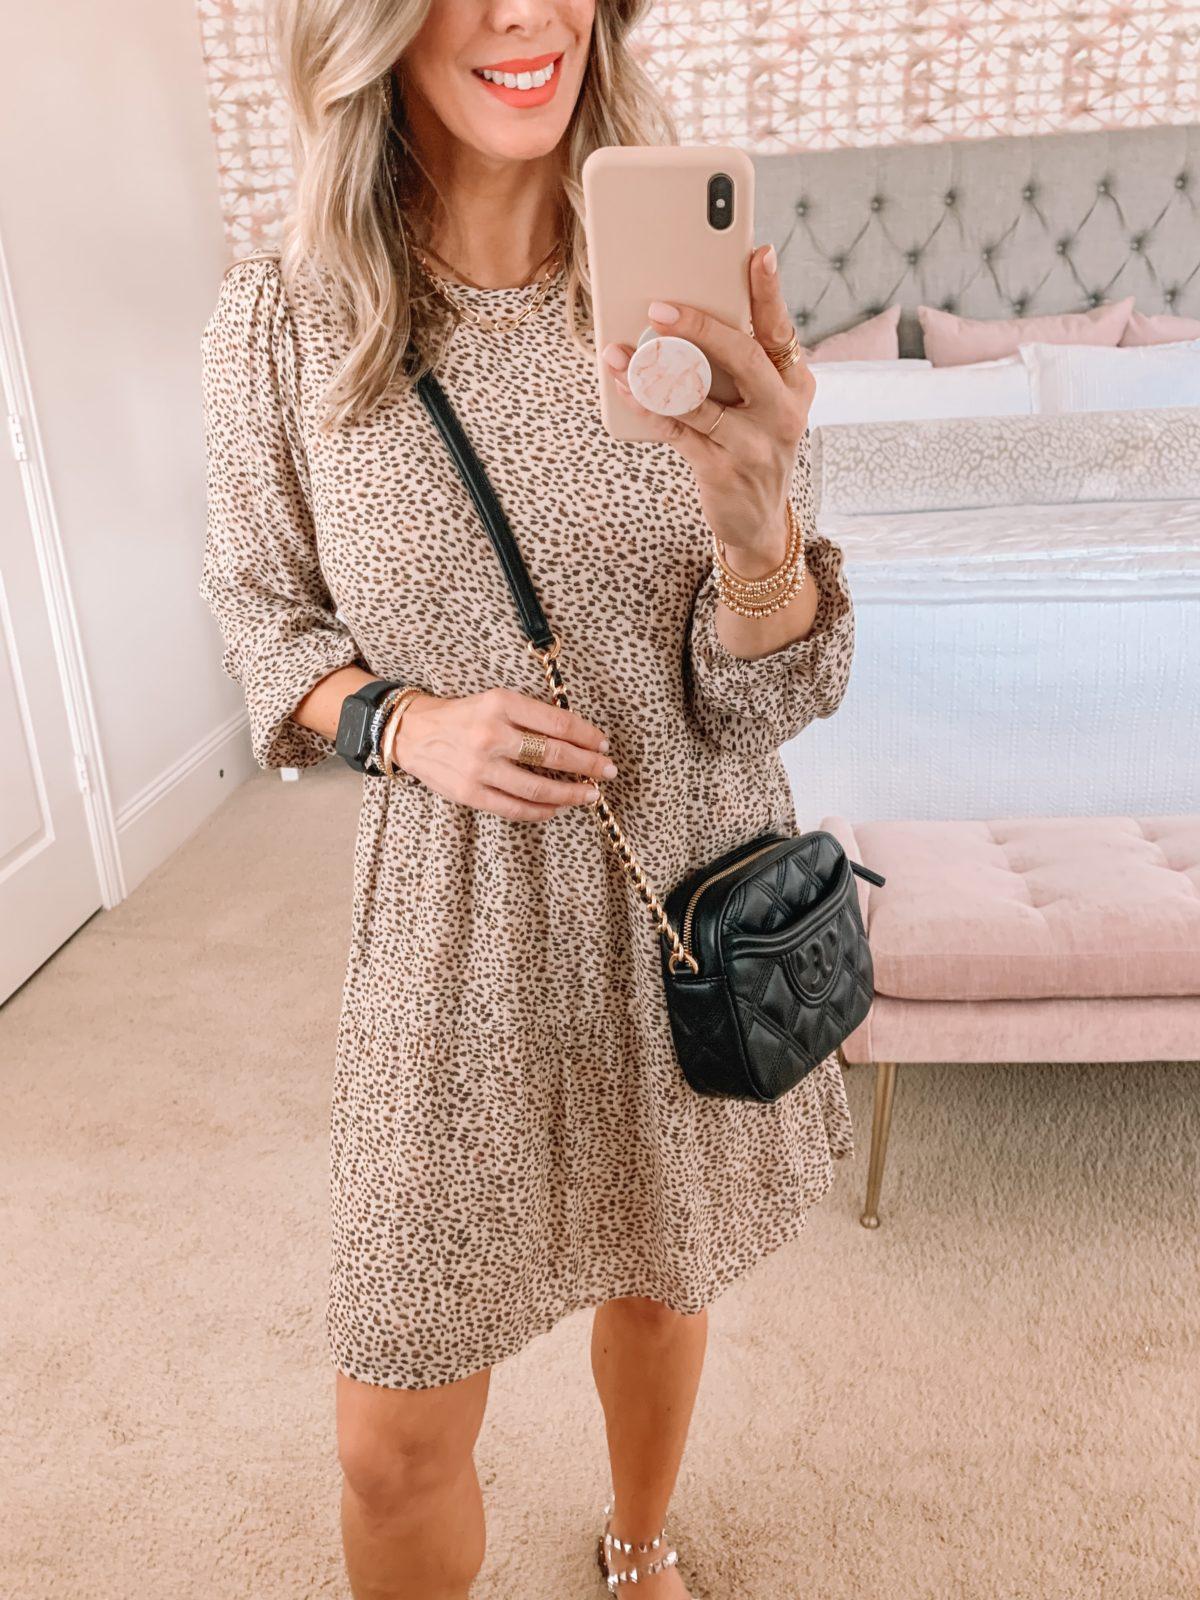 Dressing Room Finds, Nordstrom, Abercrombie, Leopard dress, Sandals, Crossbody